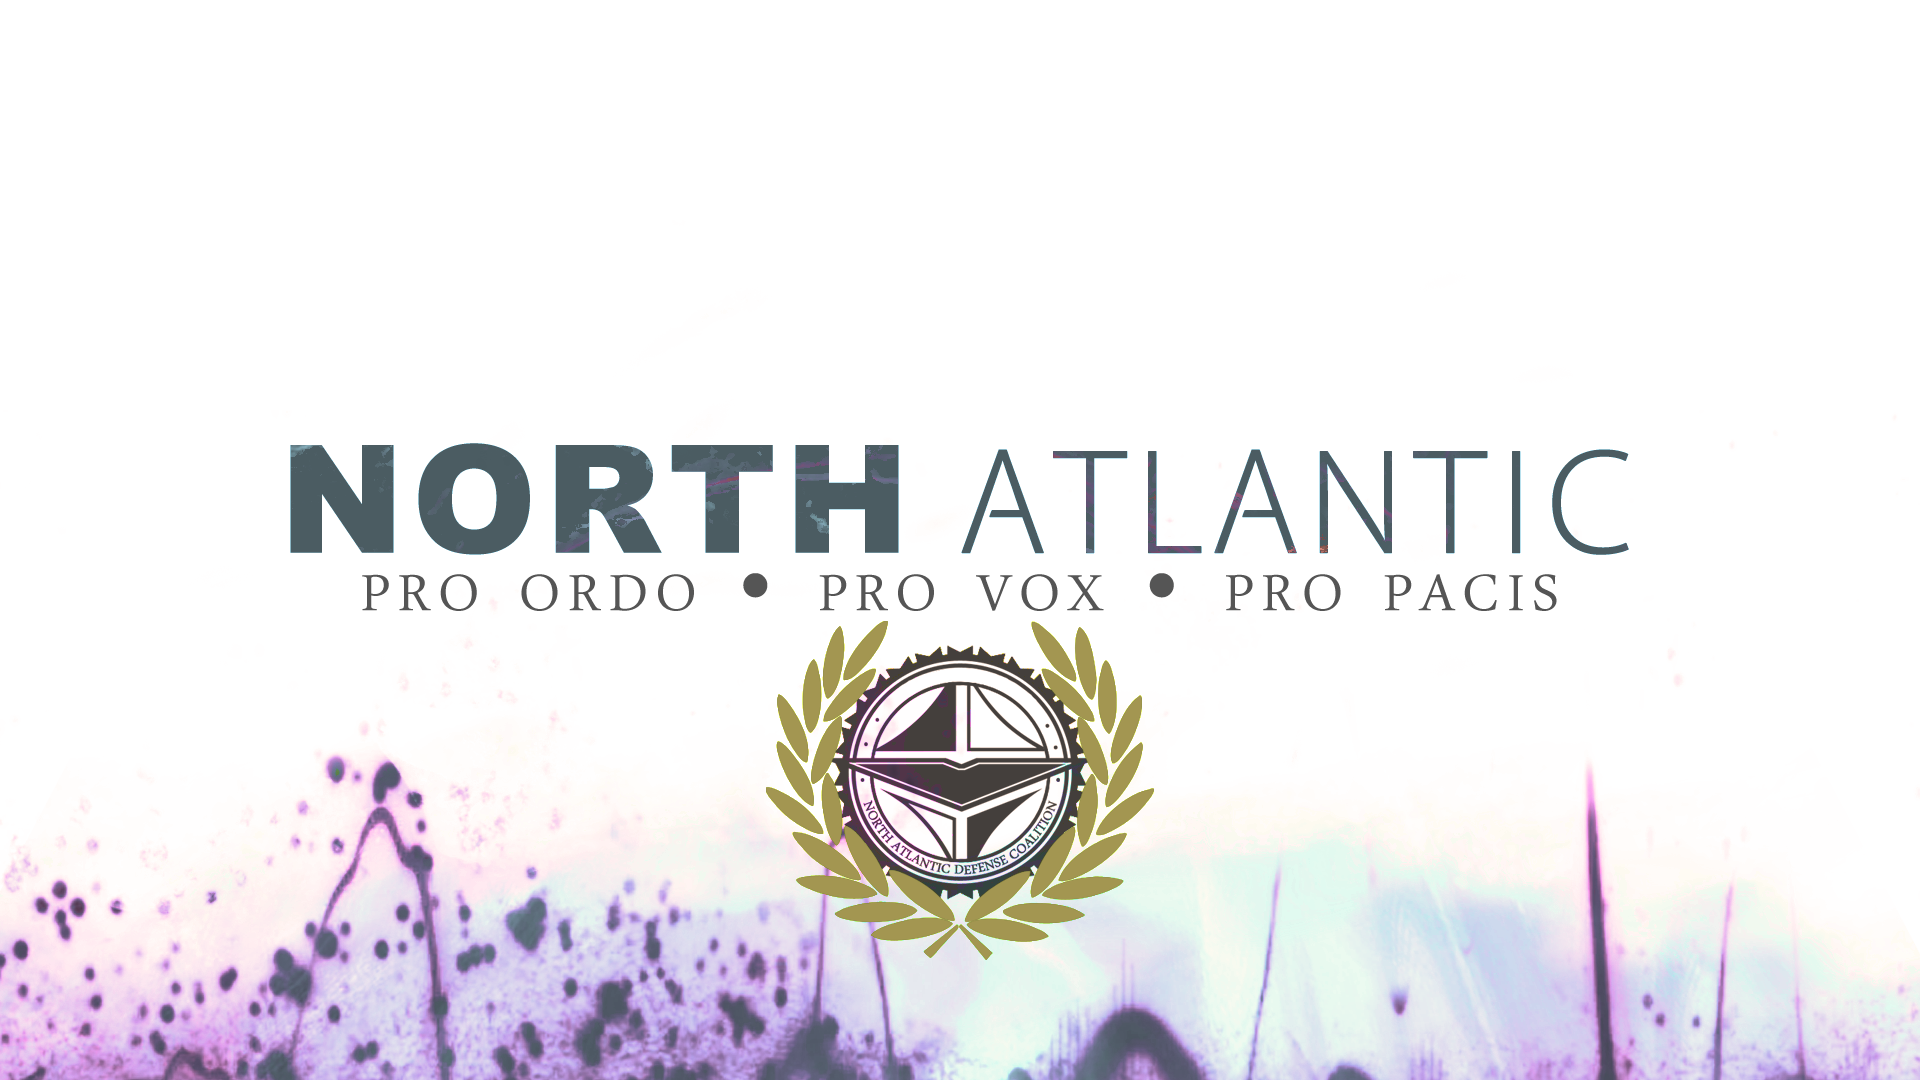 North Atlantic Grunge by brihunt